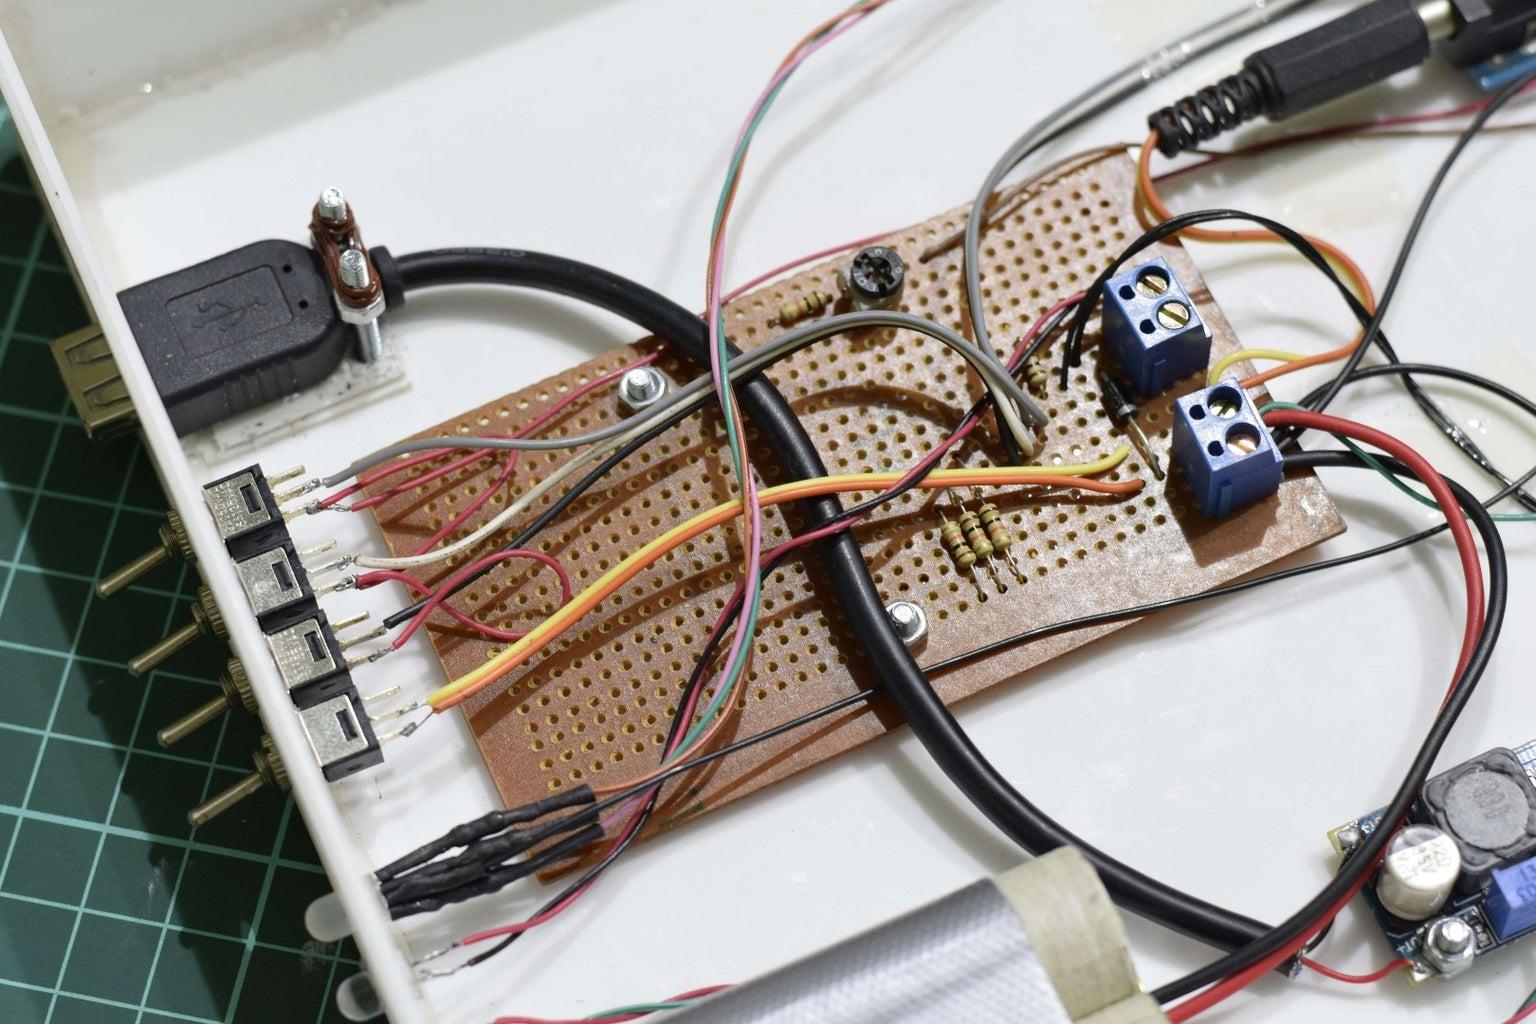 Constructing the Circuit